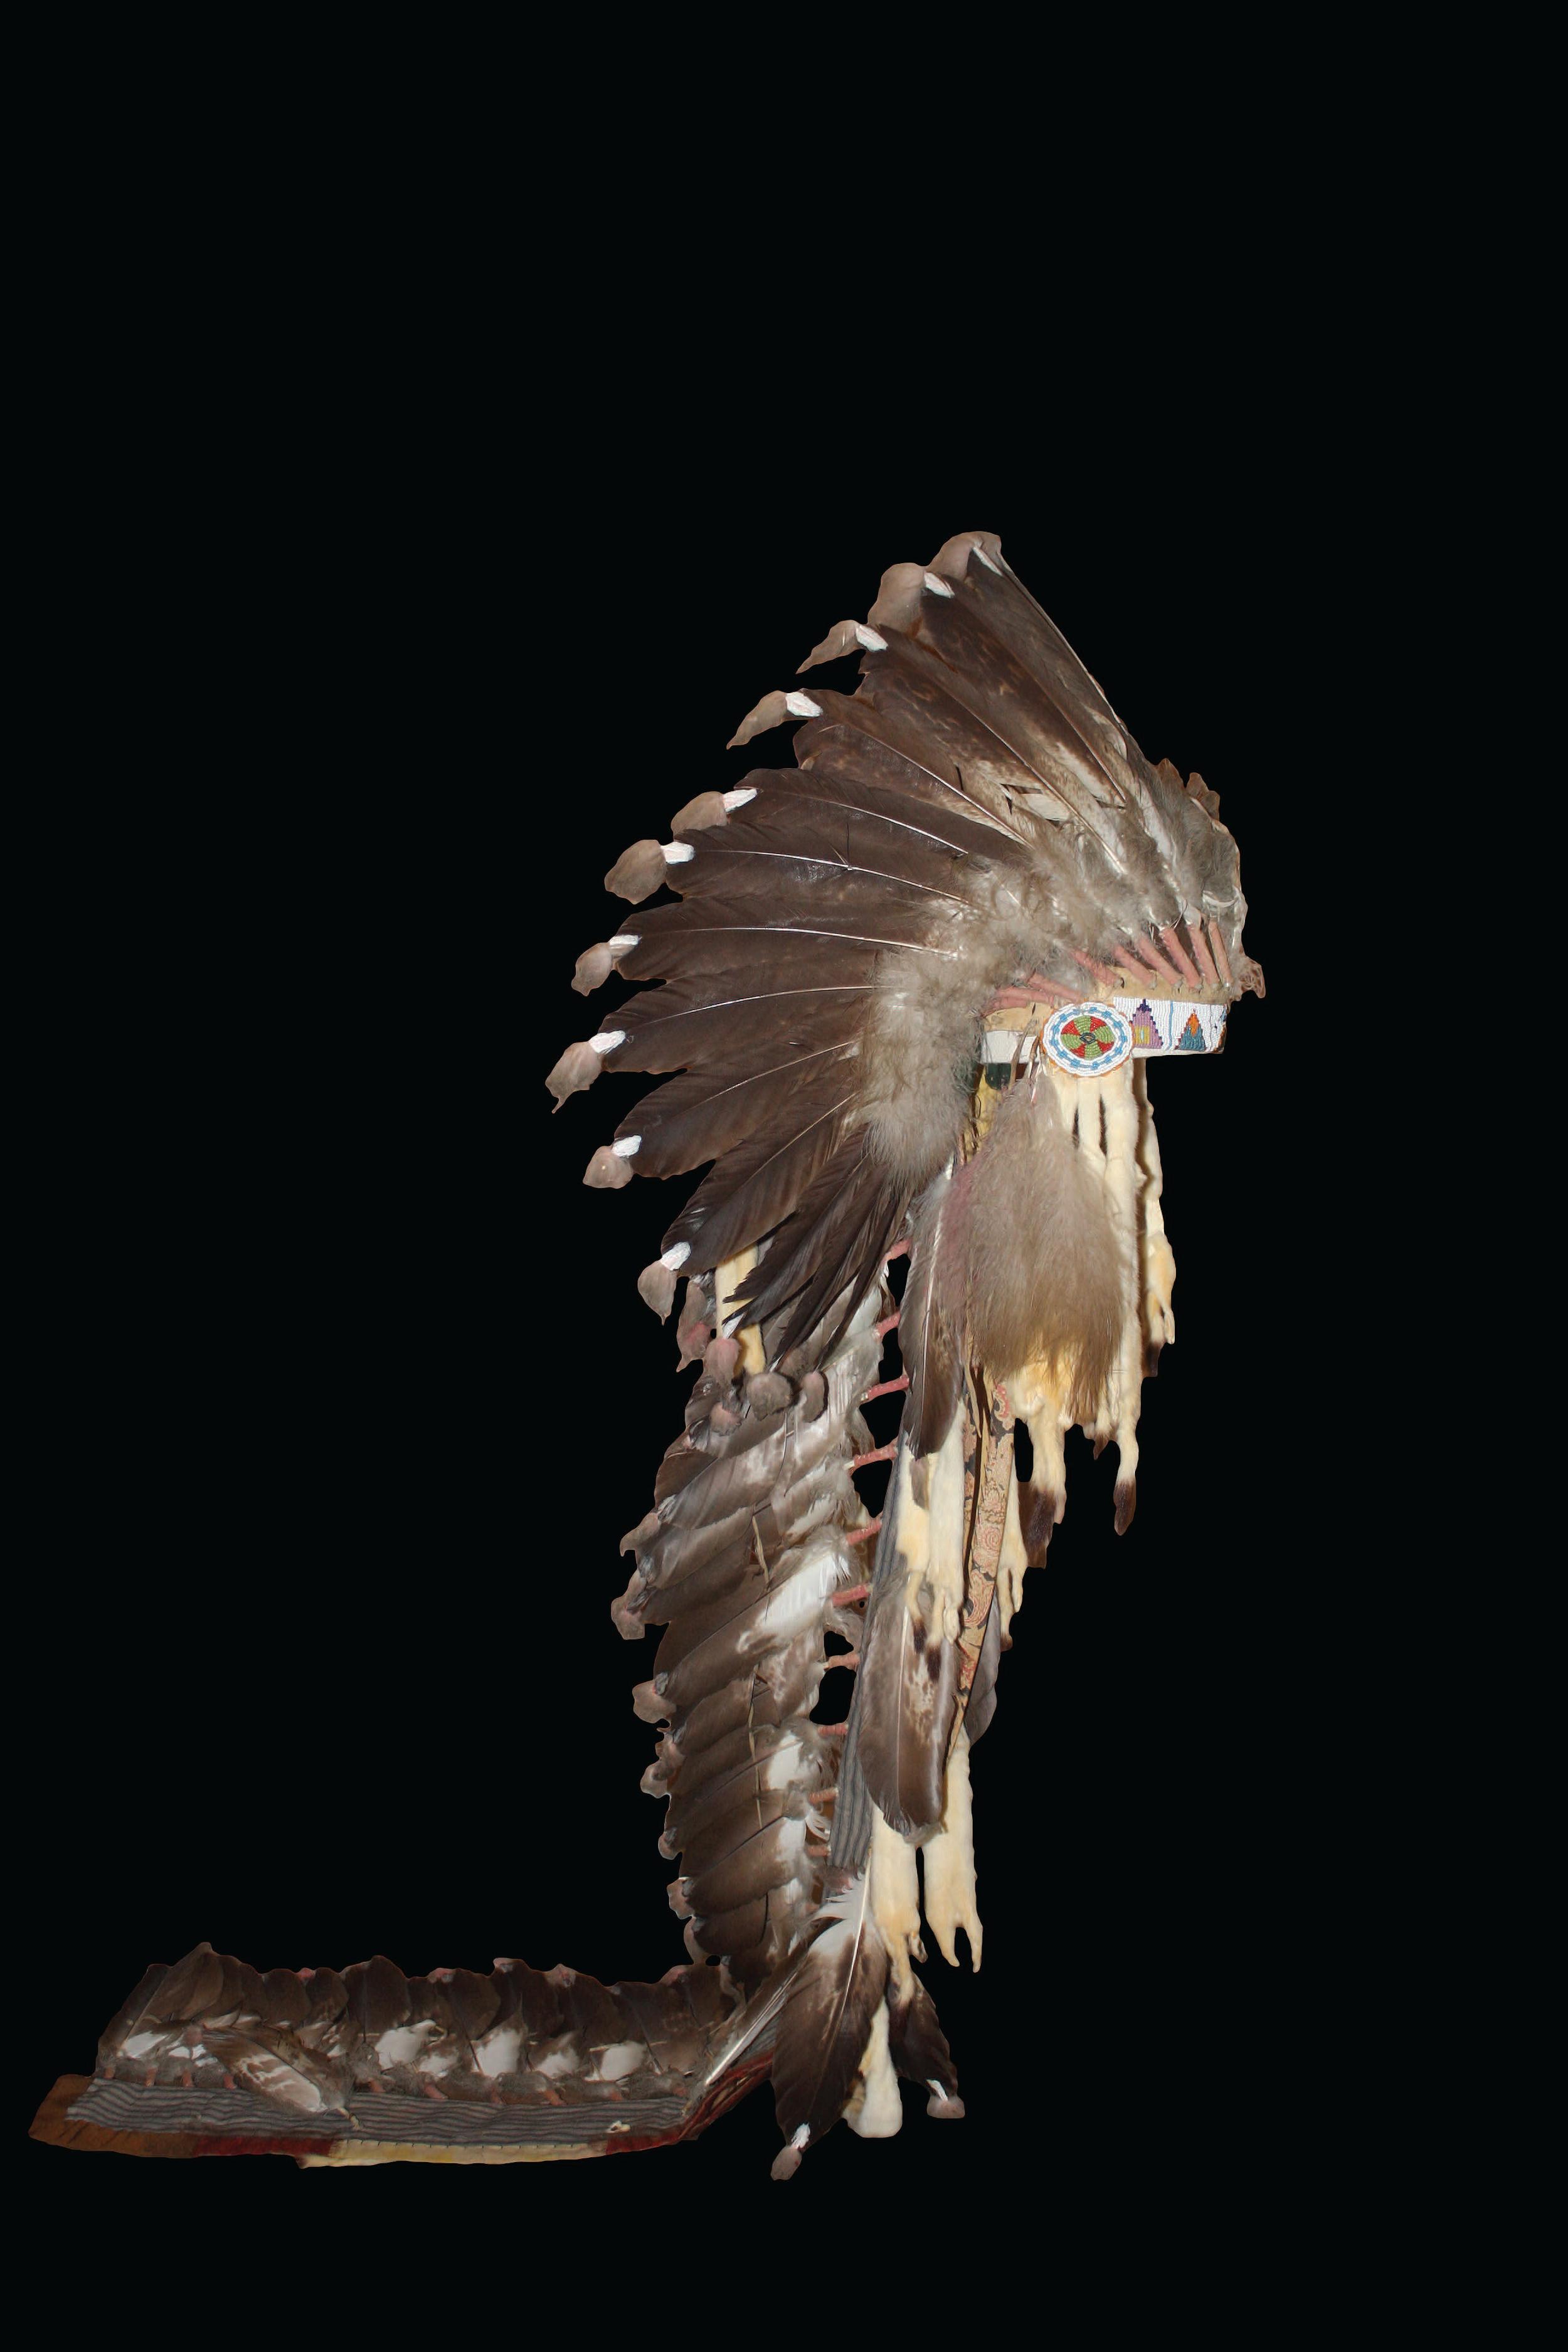 Blackfoot Headdress, ca. late 1800s. On loan from the University of Arkansas.